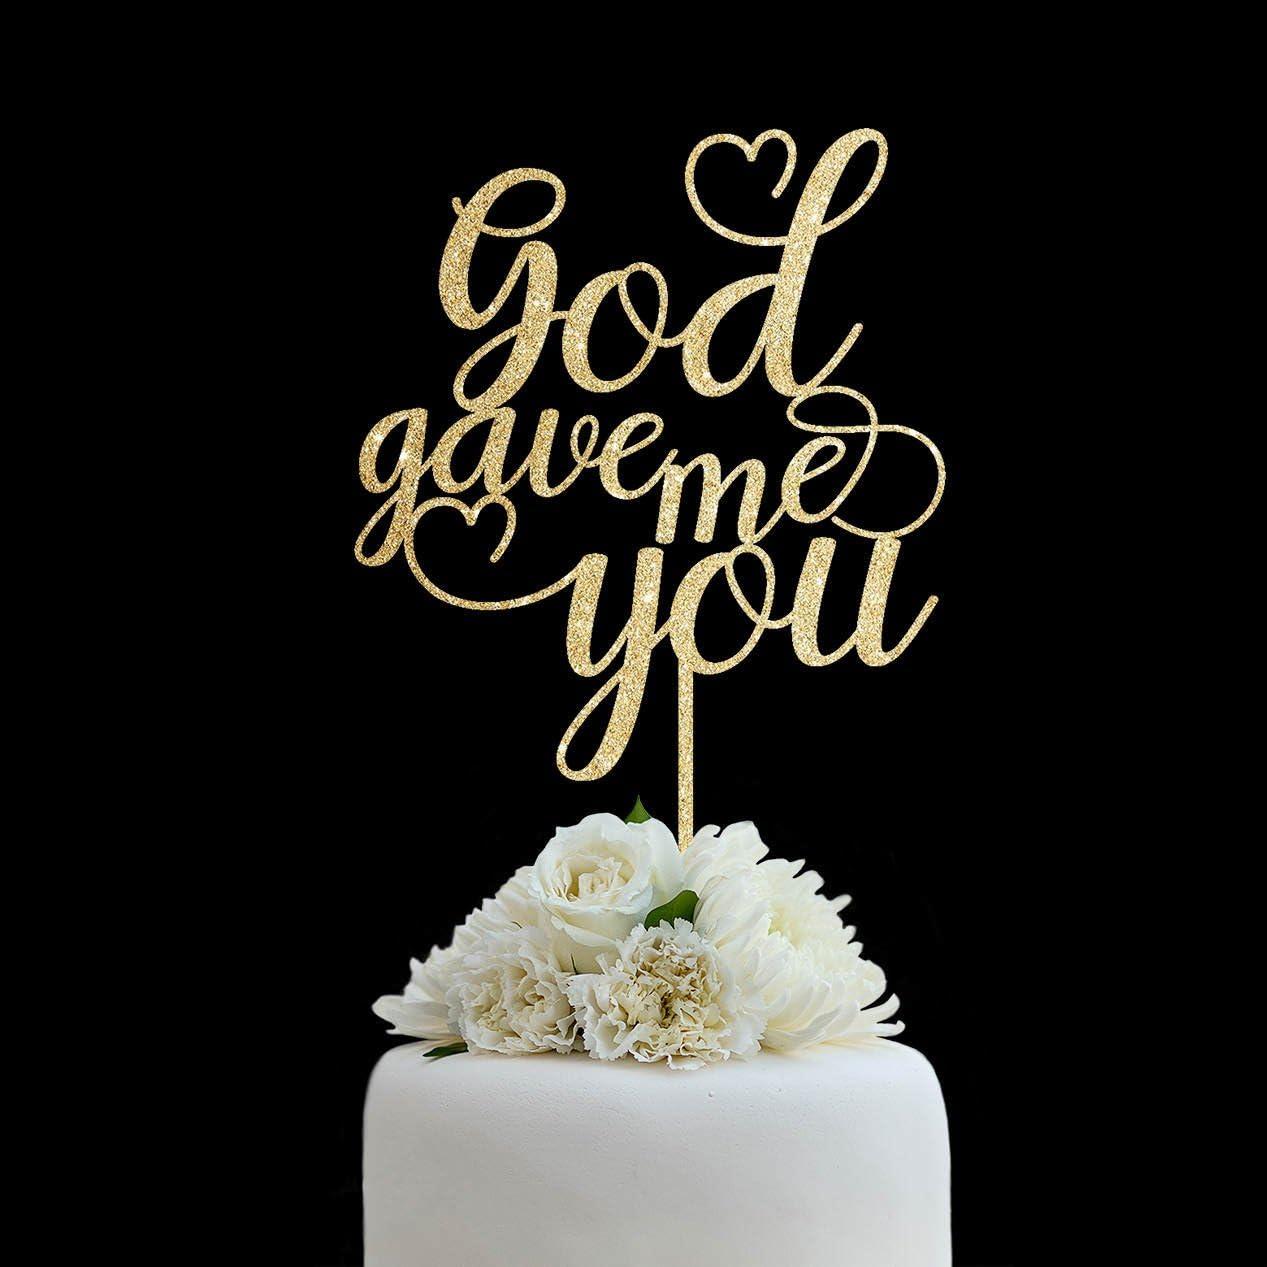 Amazon Com Customized Cake Topper Personalized For Wedding Custom